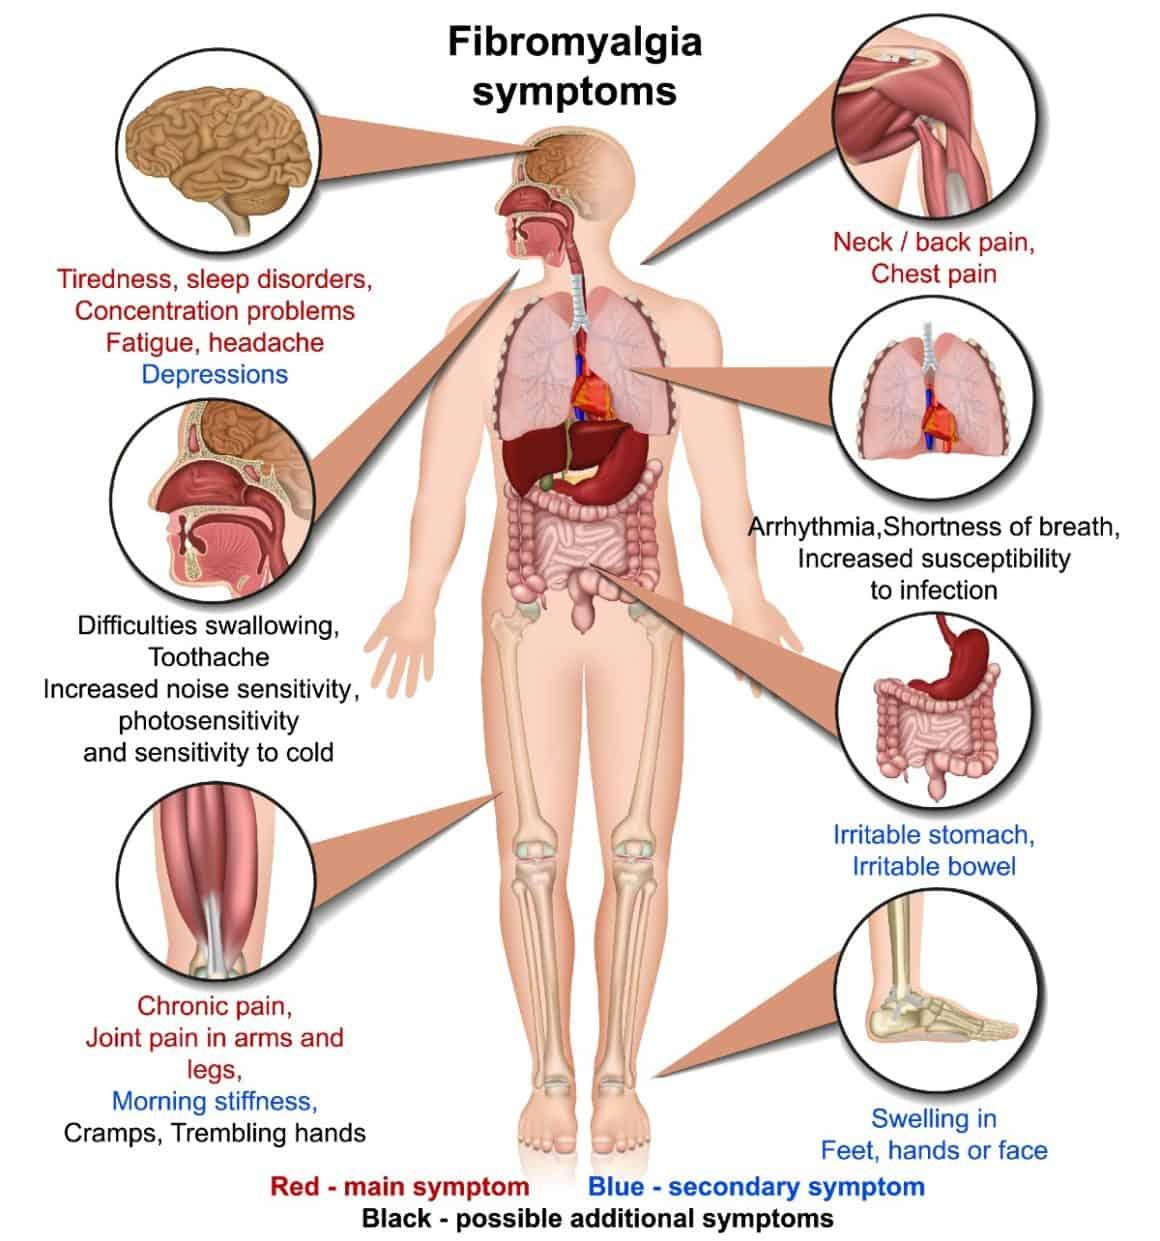 fibromyalgia symptoms medical vector illustration isolated on white background infographic